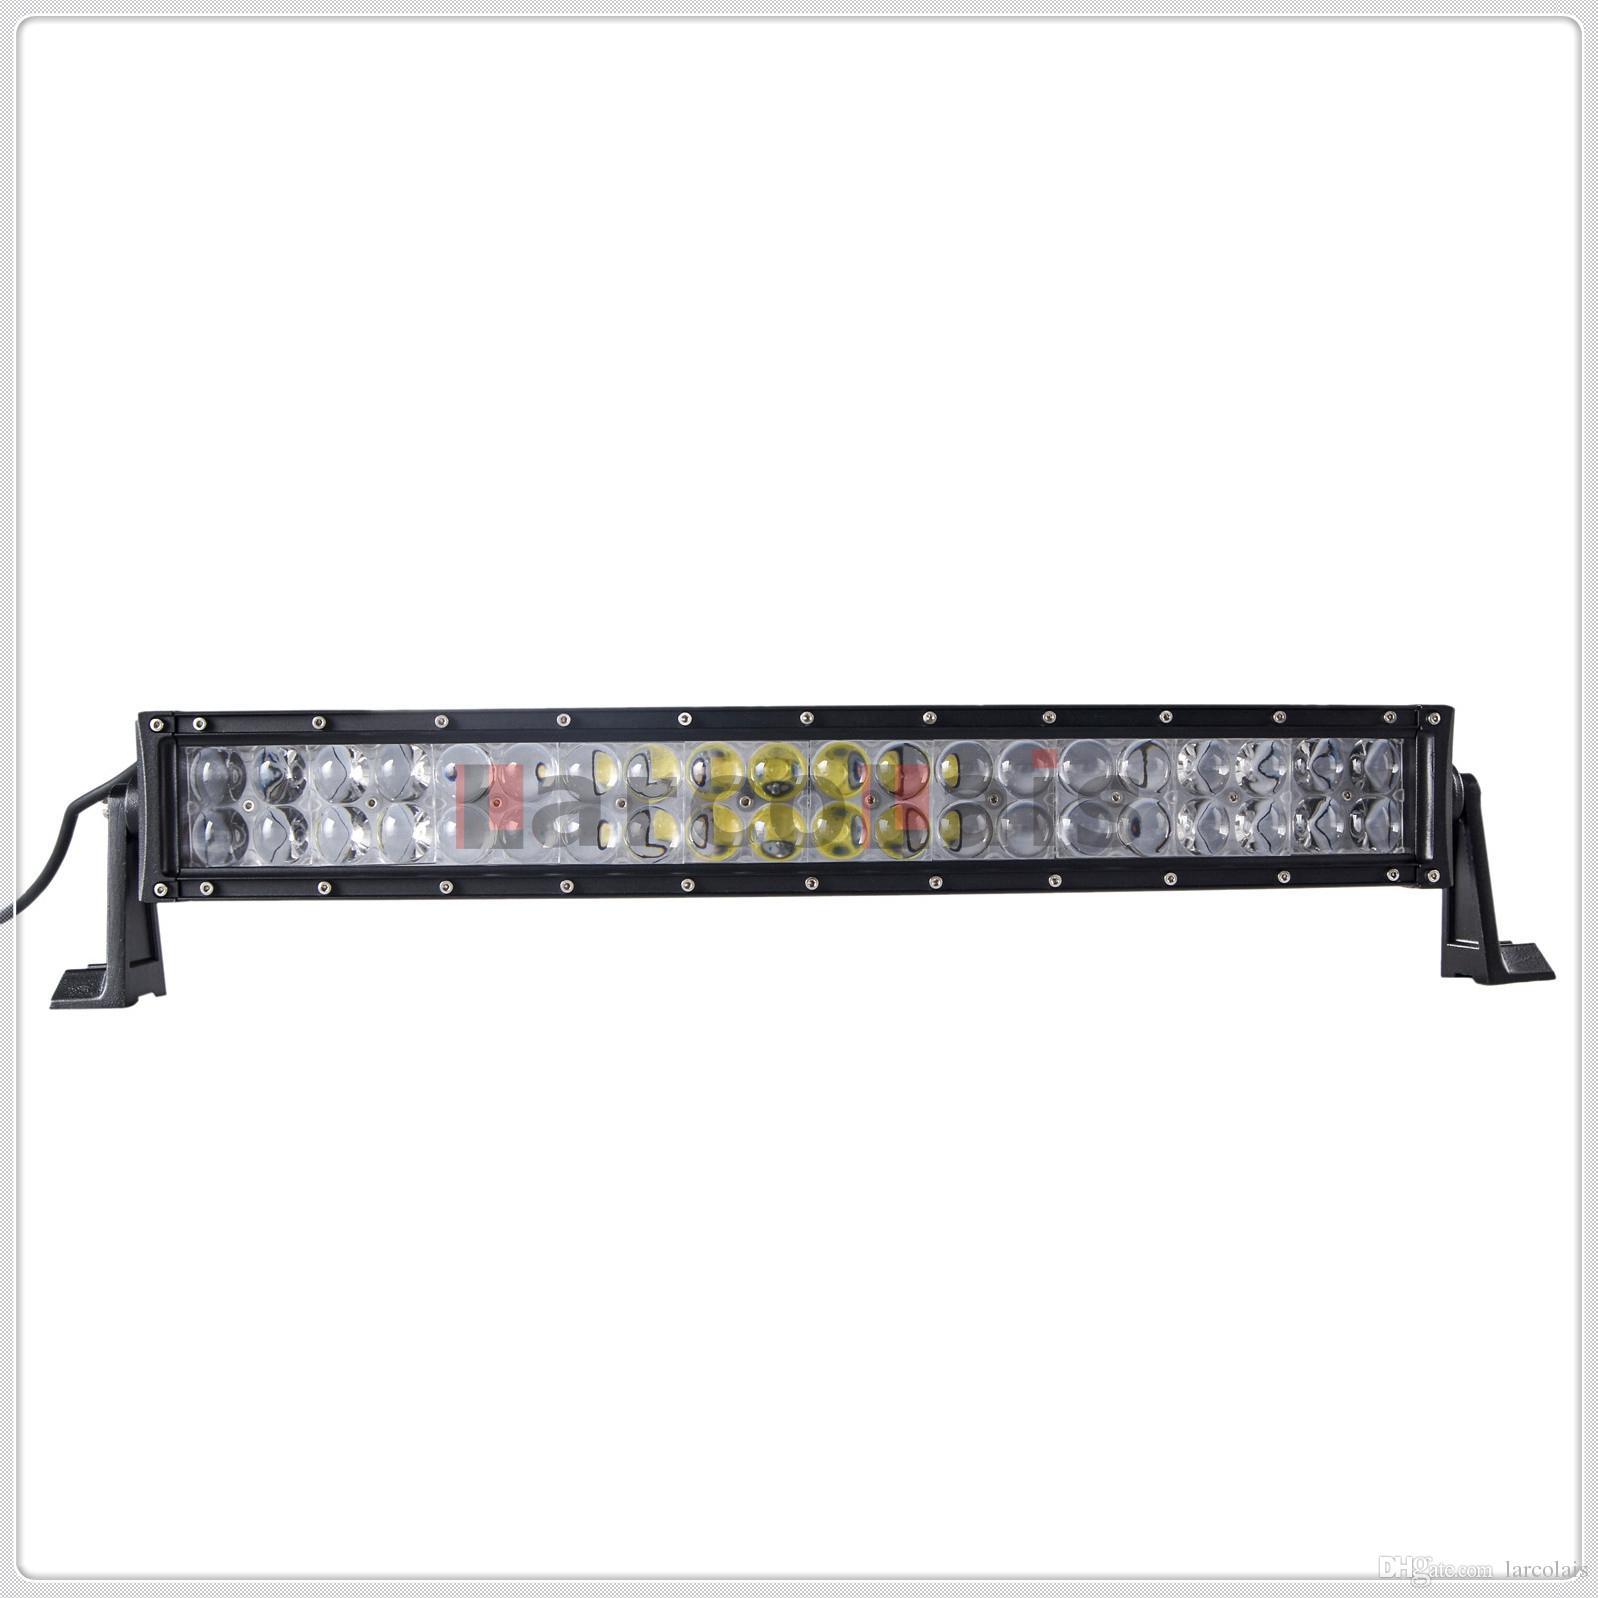 4D 22 inç 200 W Kavisli CREE LED İş Işık Bar için Traktör Tekne OffRoad 4WD 4x4 Kamyon SUV ATV Nokta Sel Combo Işın 12 V 24 v